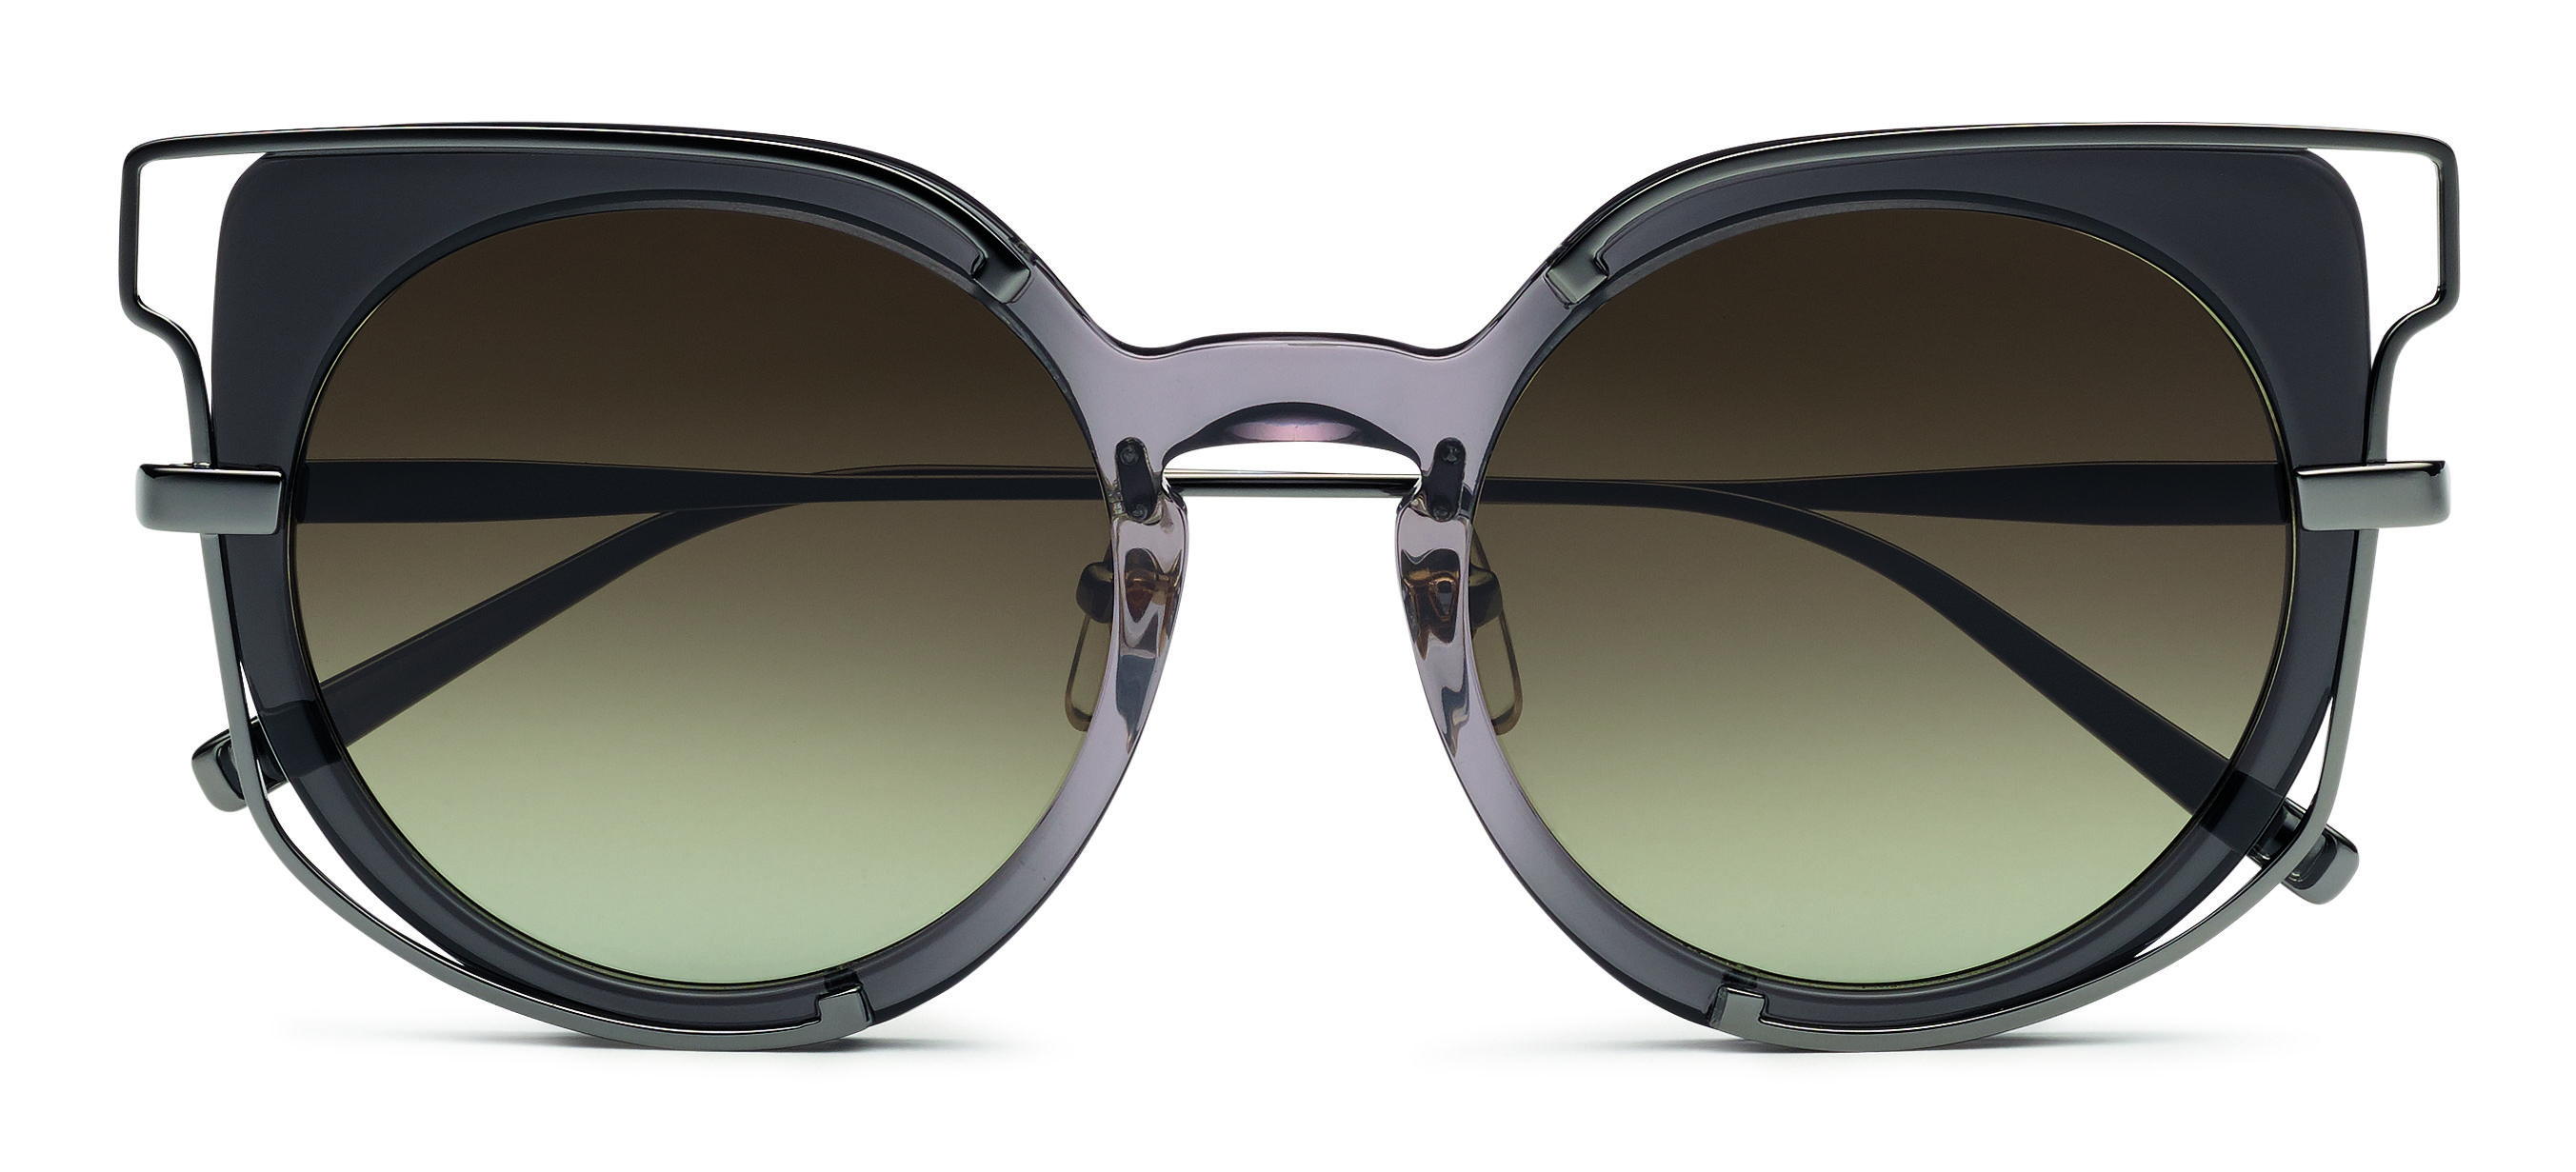 MCM Sunglasses, style MCM665S. | Designer glasses, Eyewear ...